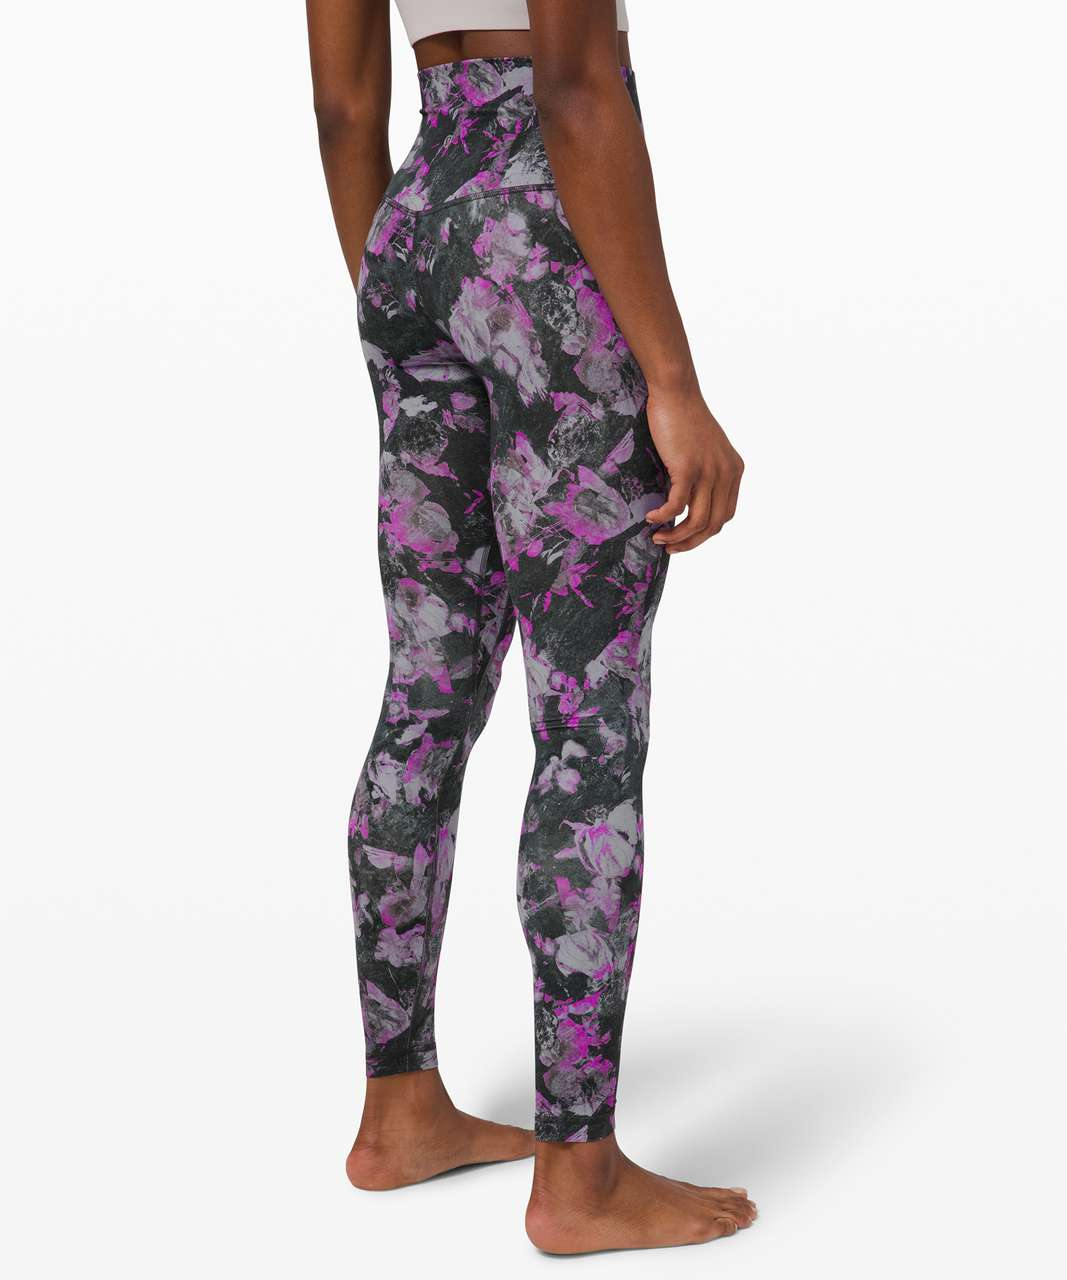 "Lululemon Align Pant 28"" - Floral Shift Multi"